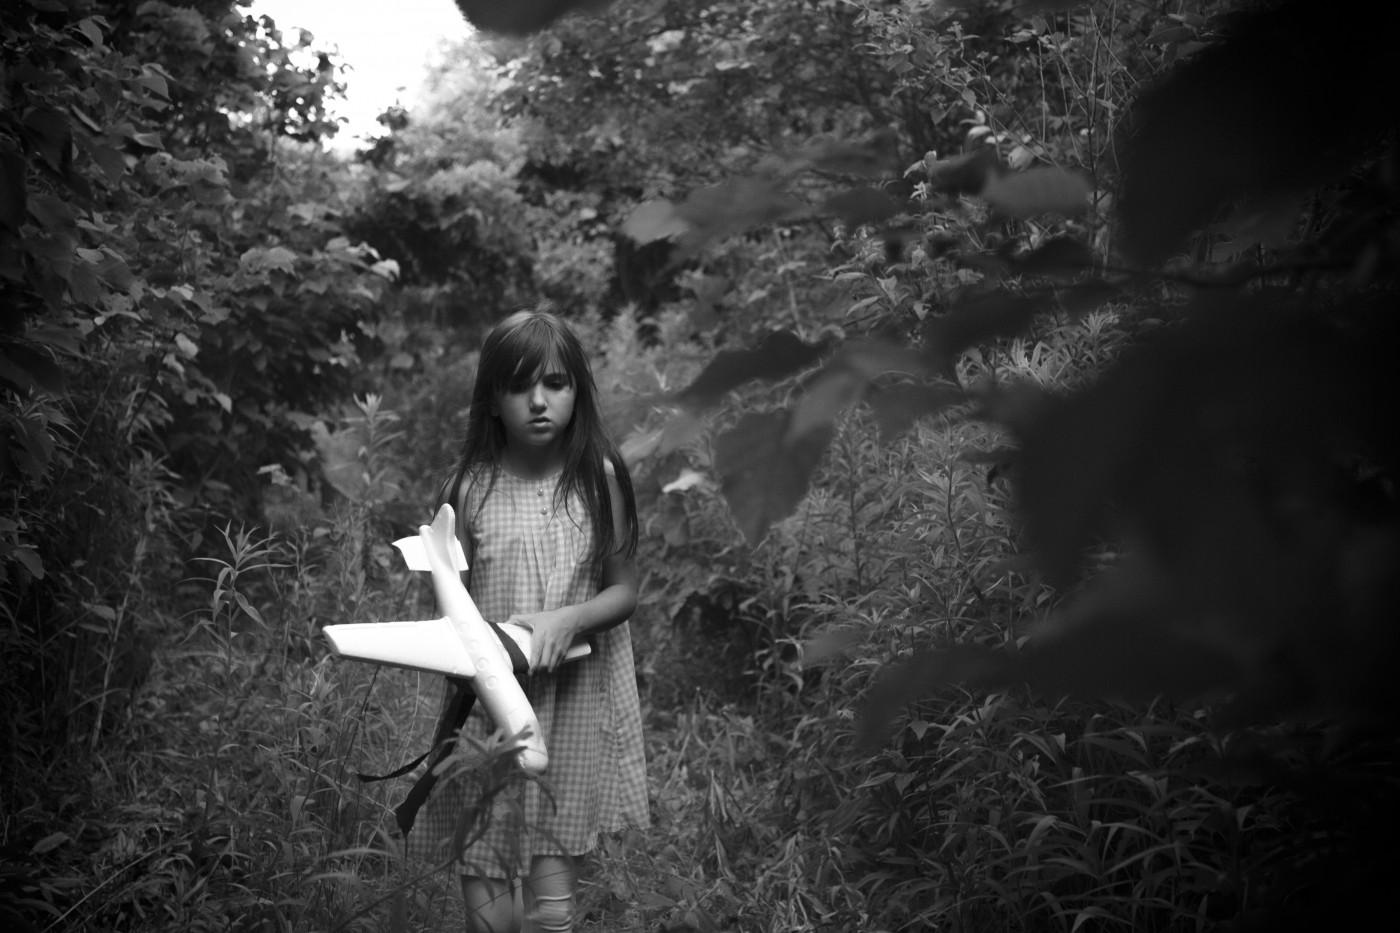 Yulia Starostina, </span><span><em>Be brave</em>, </span><span>2015